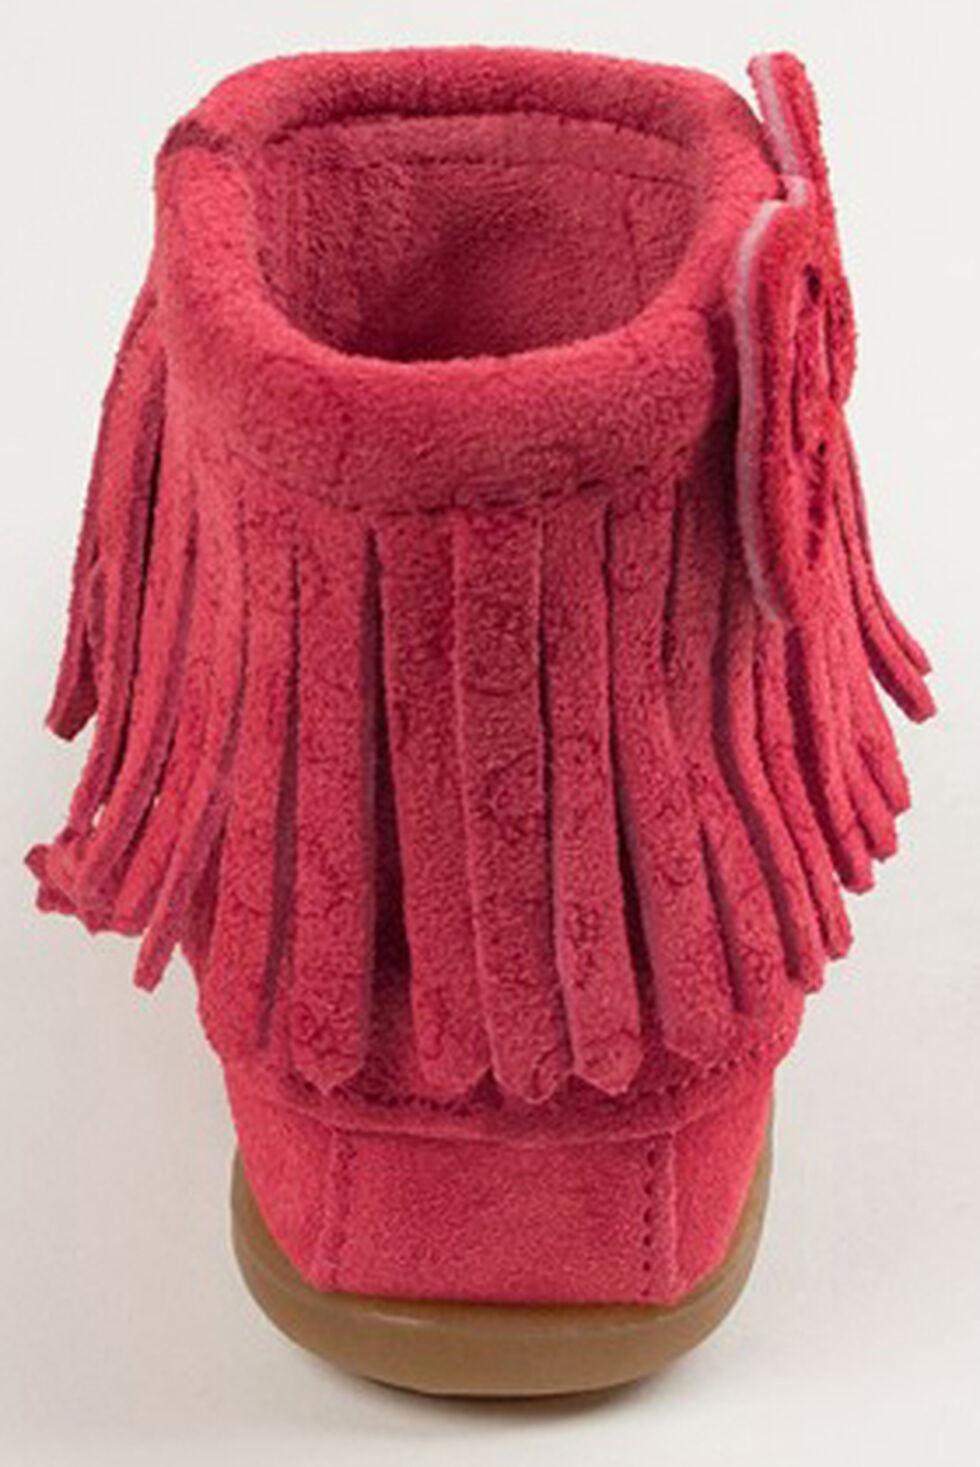 Minnetonka Girls' Hello Kitty Fringe Booties - Moc Toe, Hot Pink, hi-res